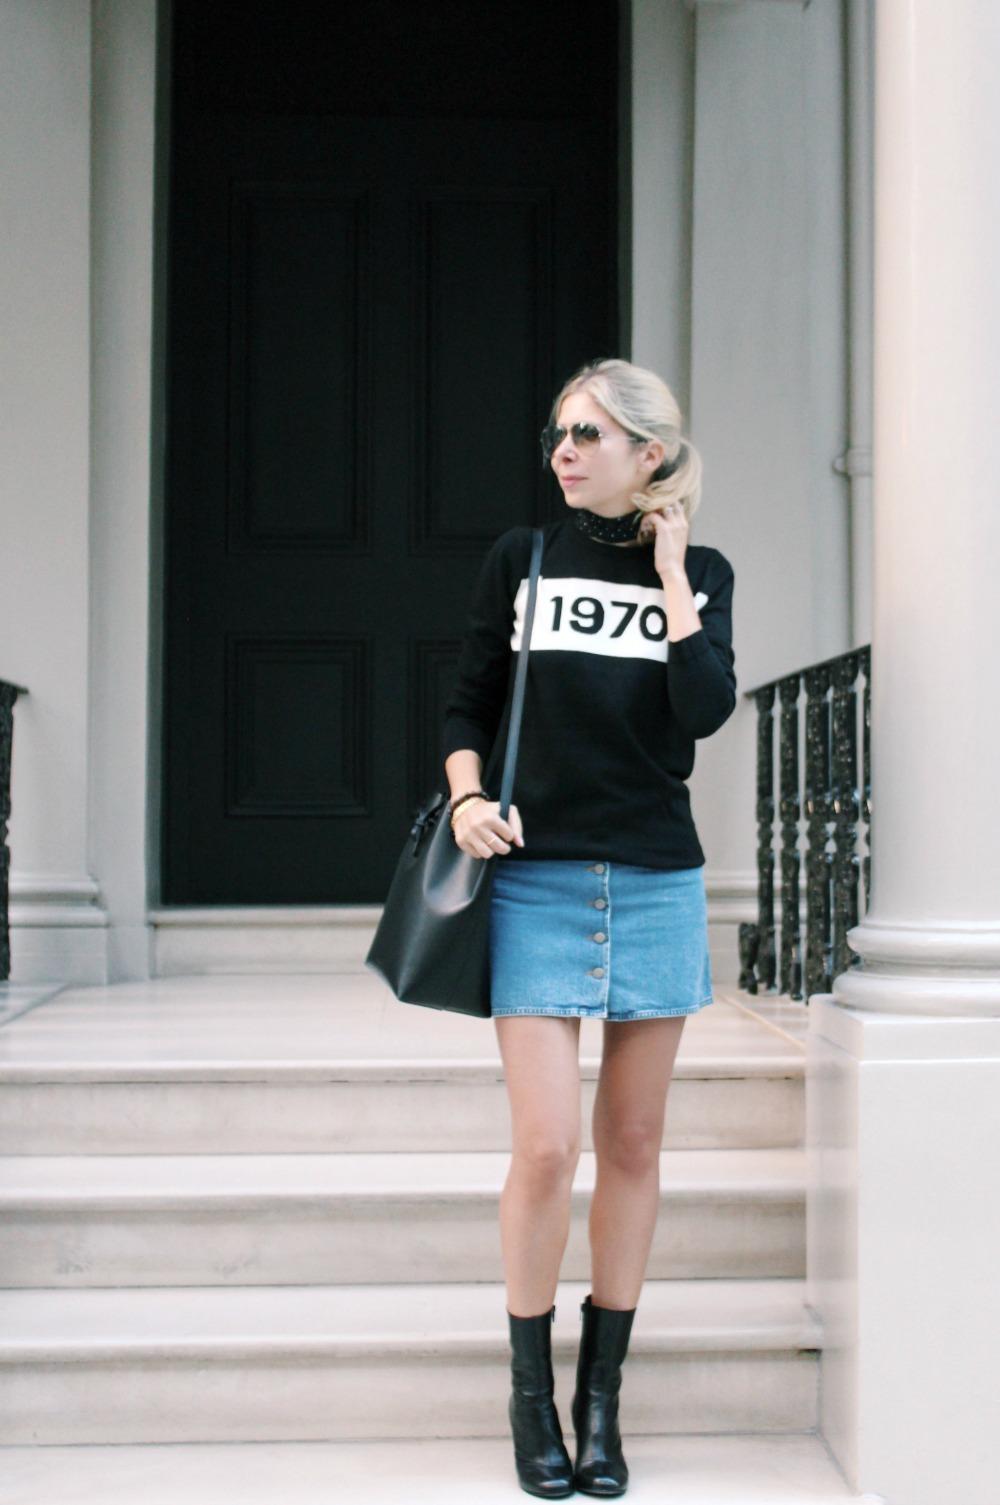 Wearing Bella Freud jumper, ASOS denim skirt, Russell & Bromley Boots, Mansur Gavriel bucket bag, Zara skinny scarf.